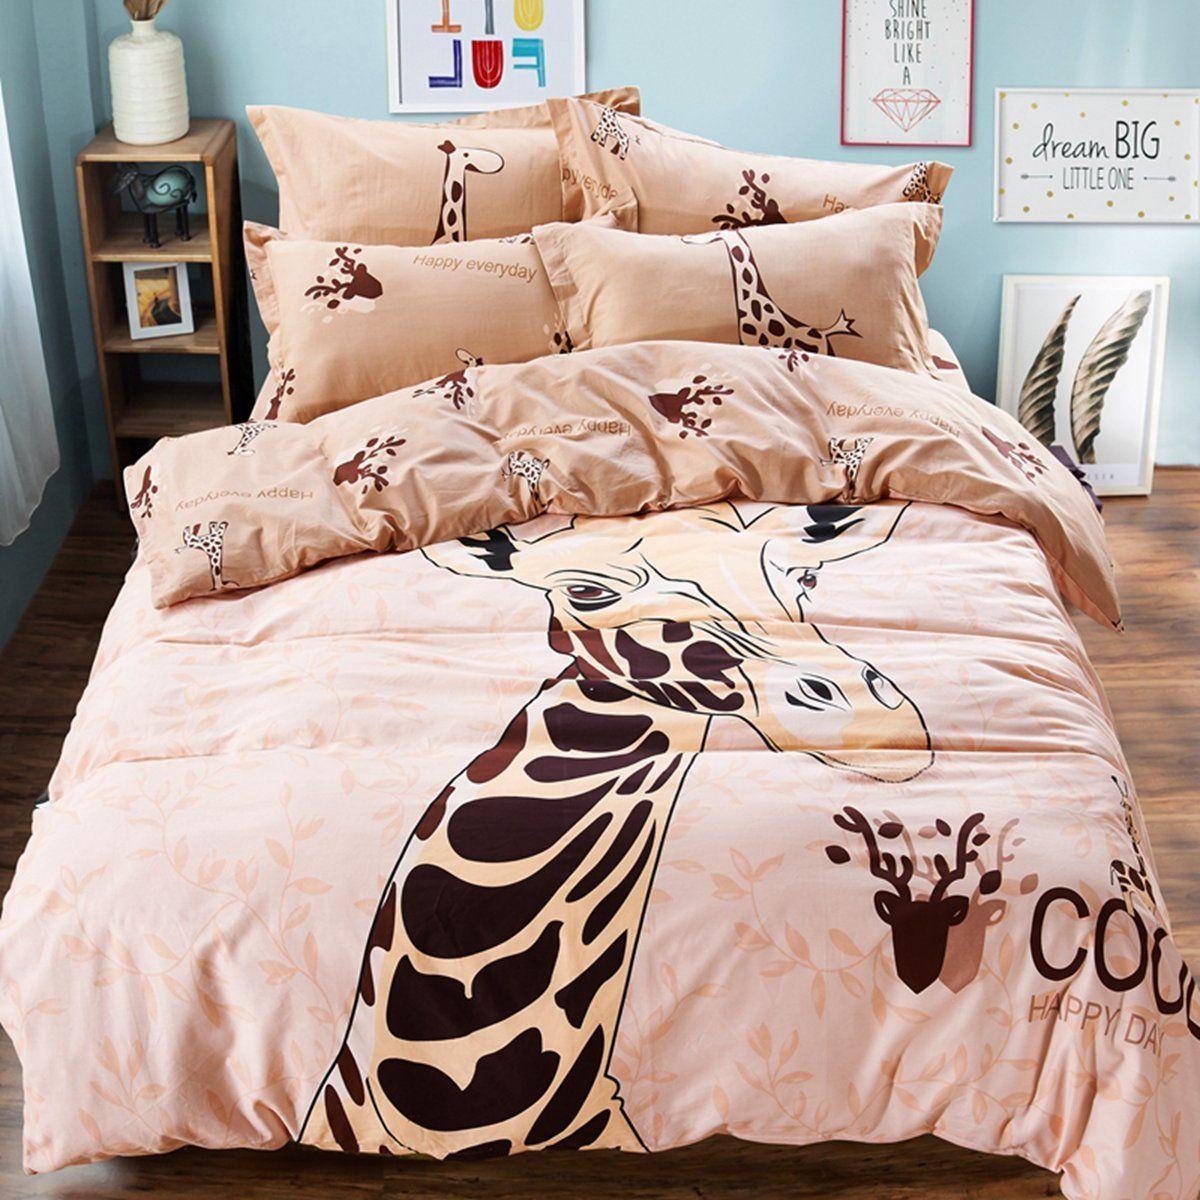 7 Piece Giraffe Animal Kingdom Bedding Comforter Set Home